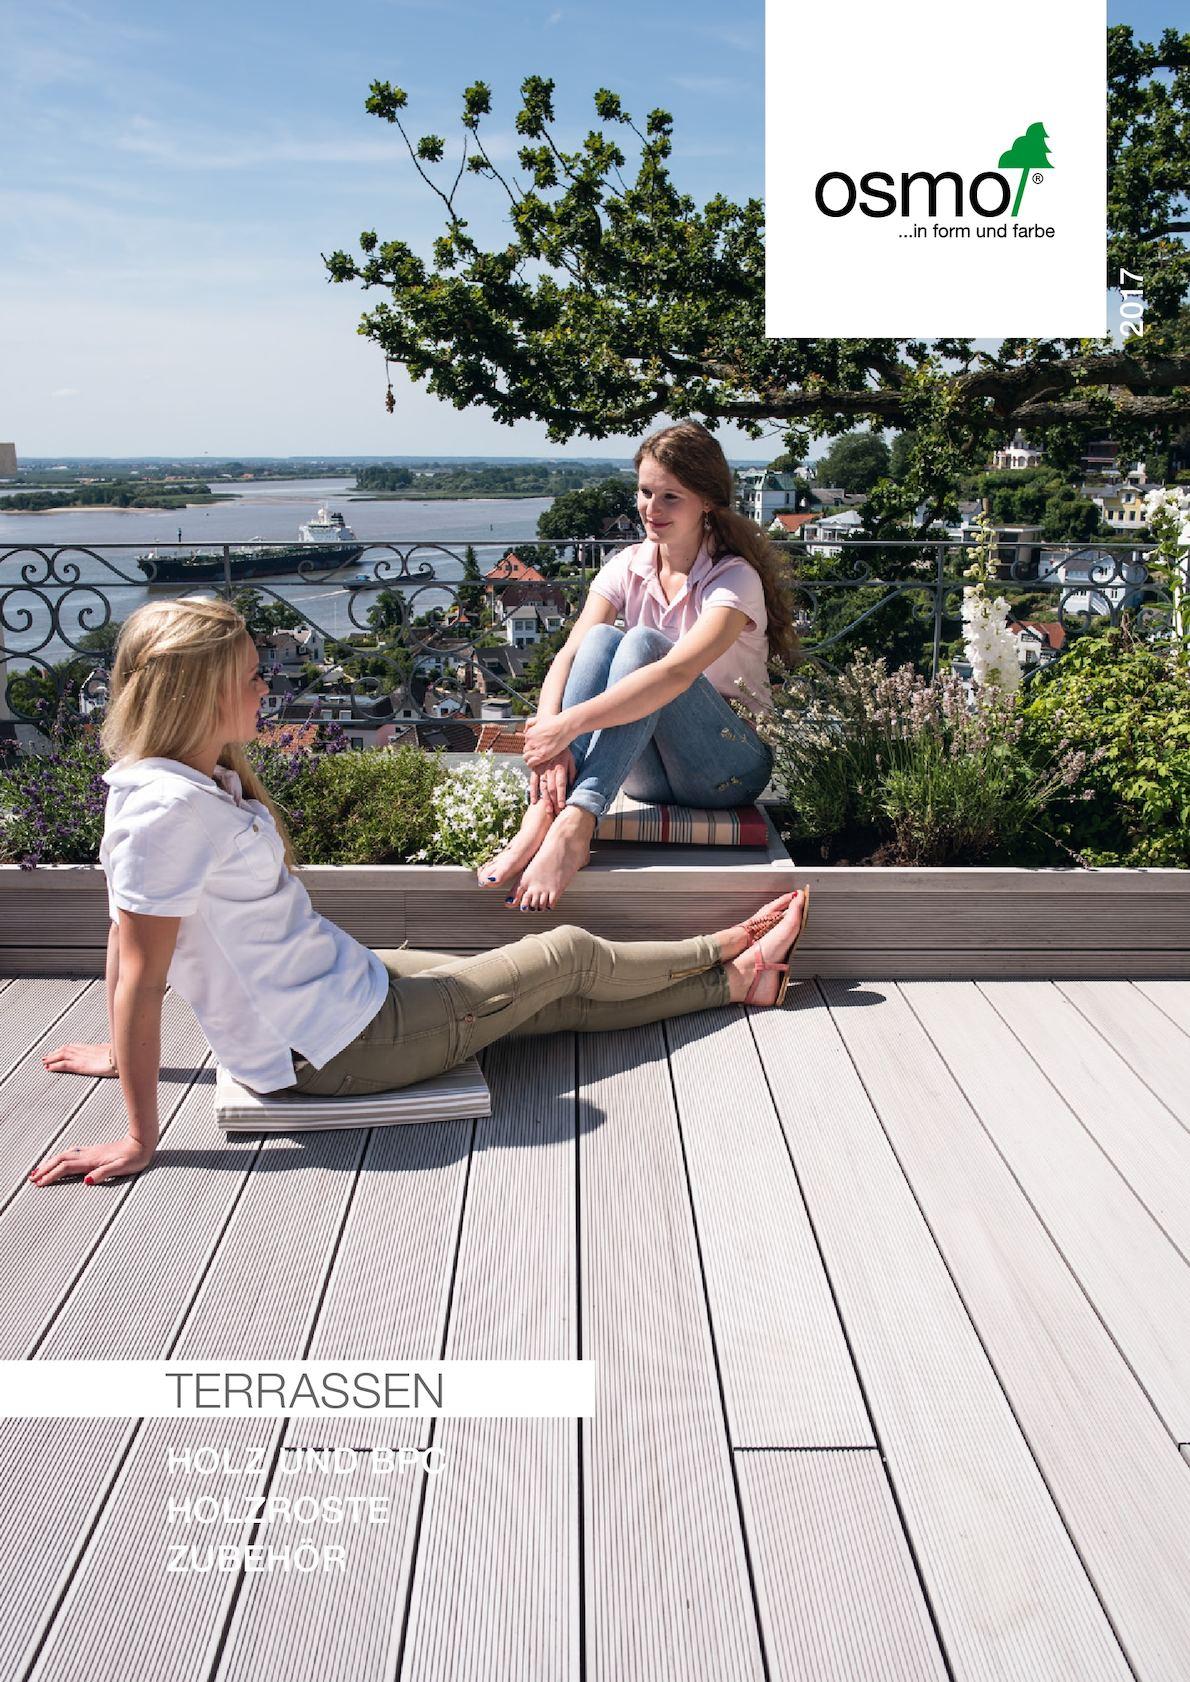 calam o osmo terrassen. Black Bedroom Furniture Sets. Home Design Ideas